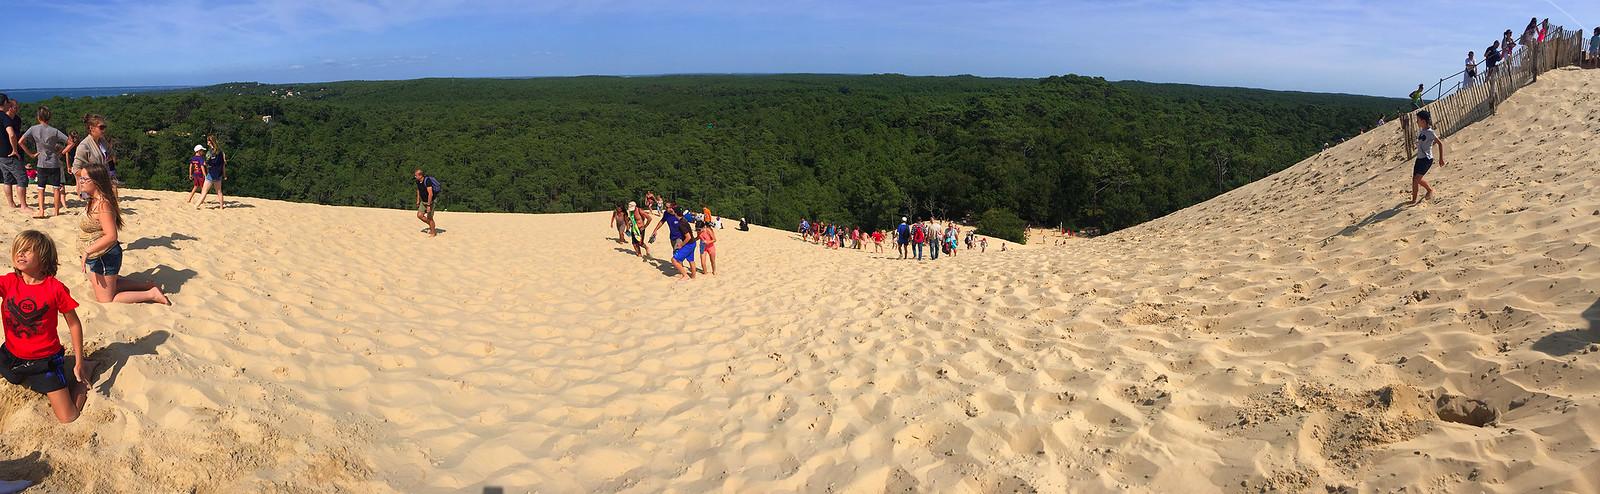 Dune du Pilat Francia Burdeos dune du pilat - 44217263550 ef51768726 h - Dune du Pilat, la duna de arena más alta de Europa